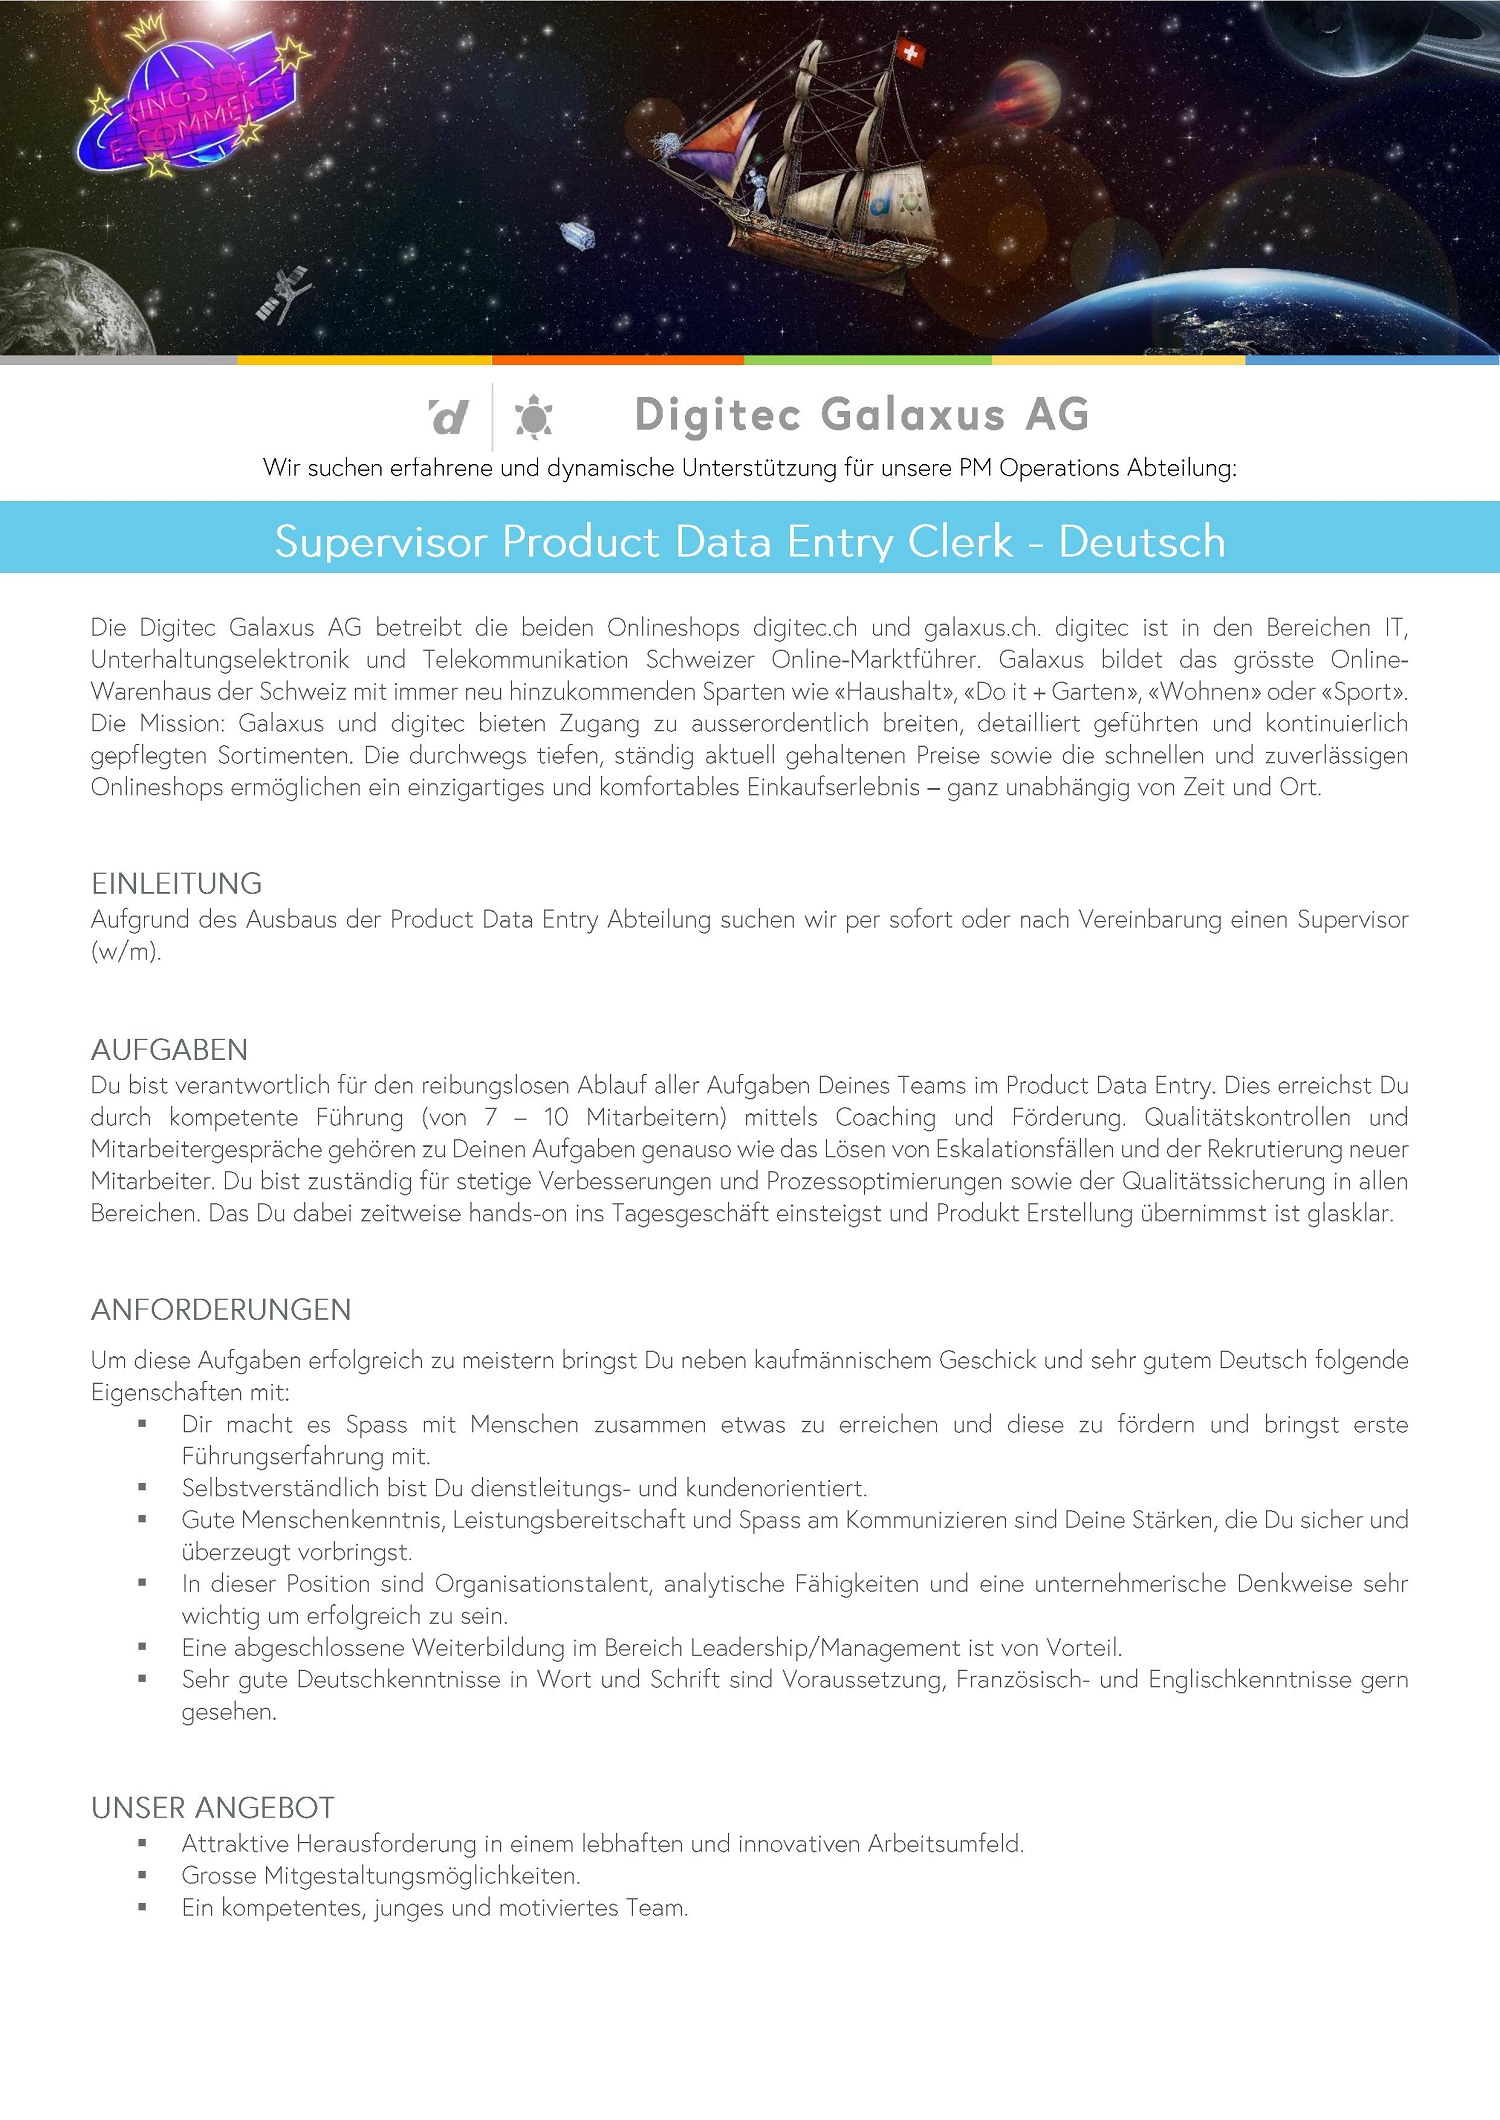 Supervisor Product Data Entry - Deutsch